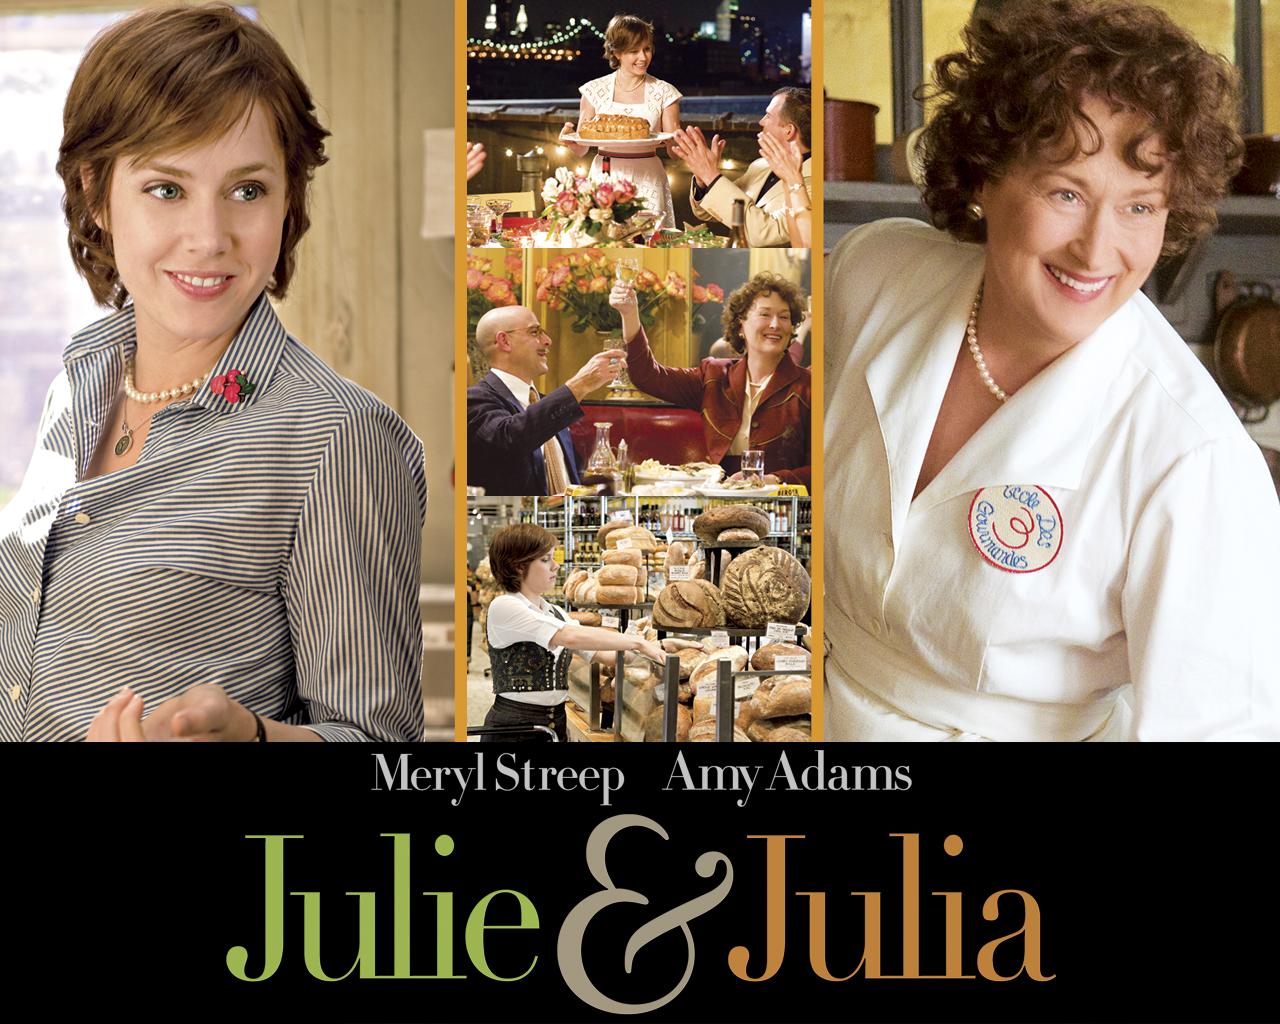 Julie and Julia Movie Image